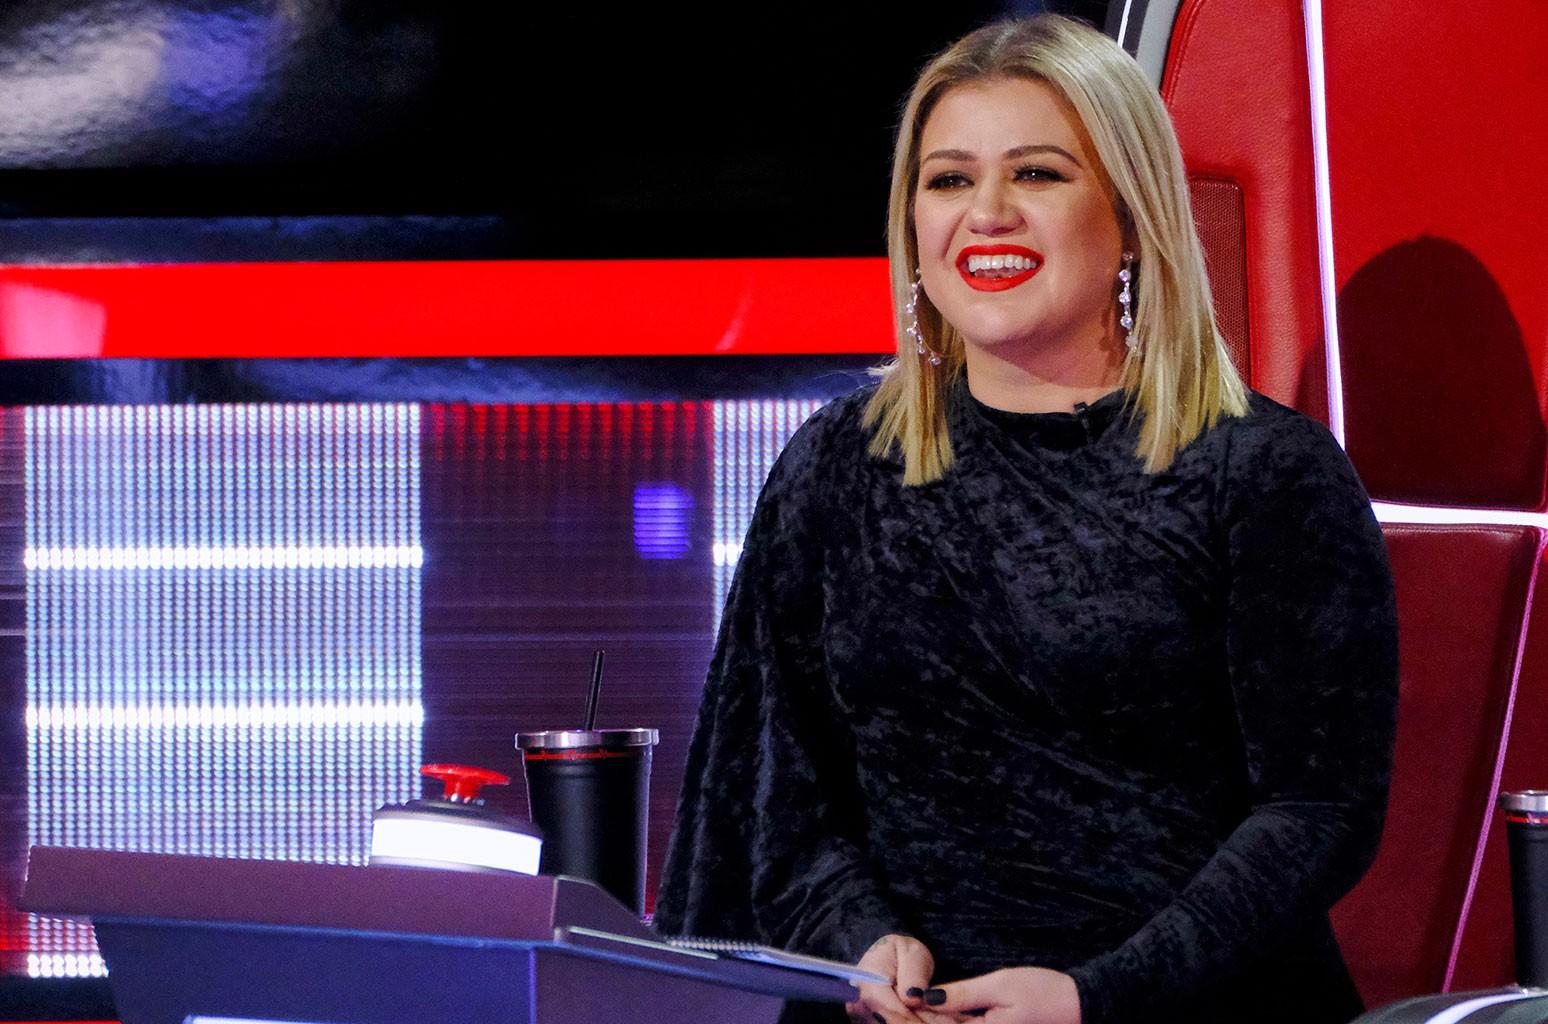 Kelly Clarkson, The Voice